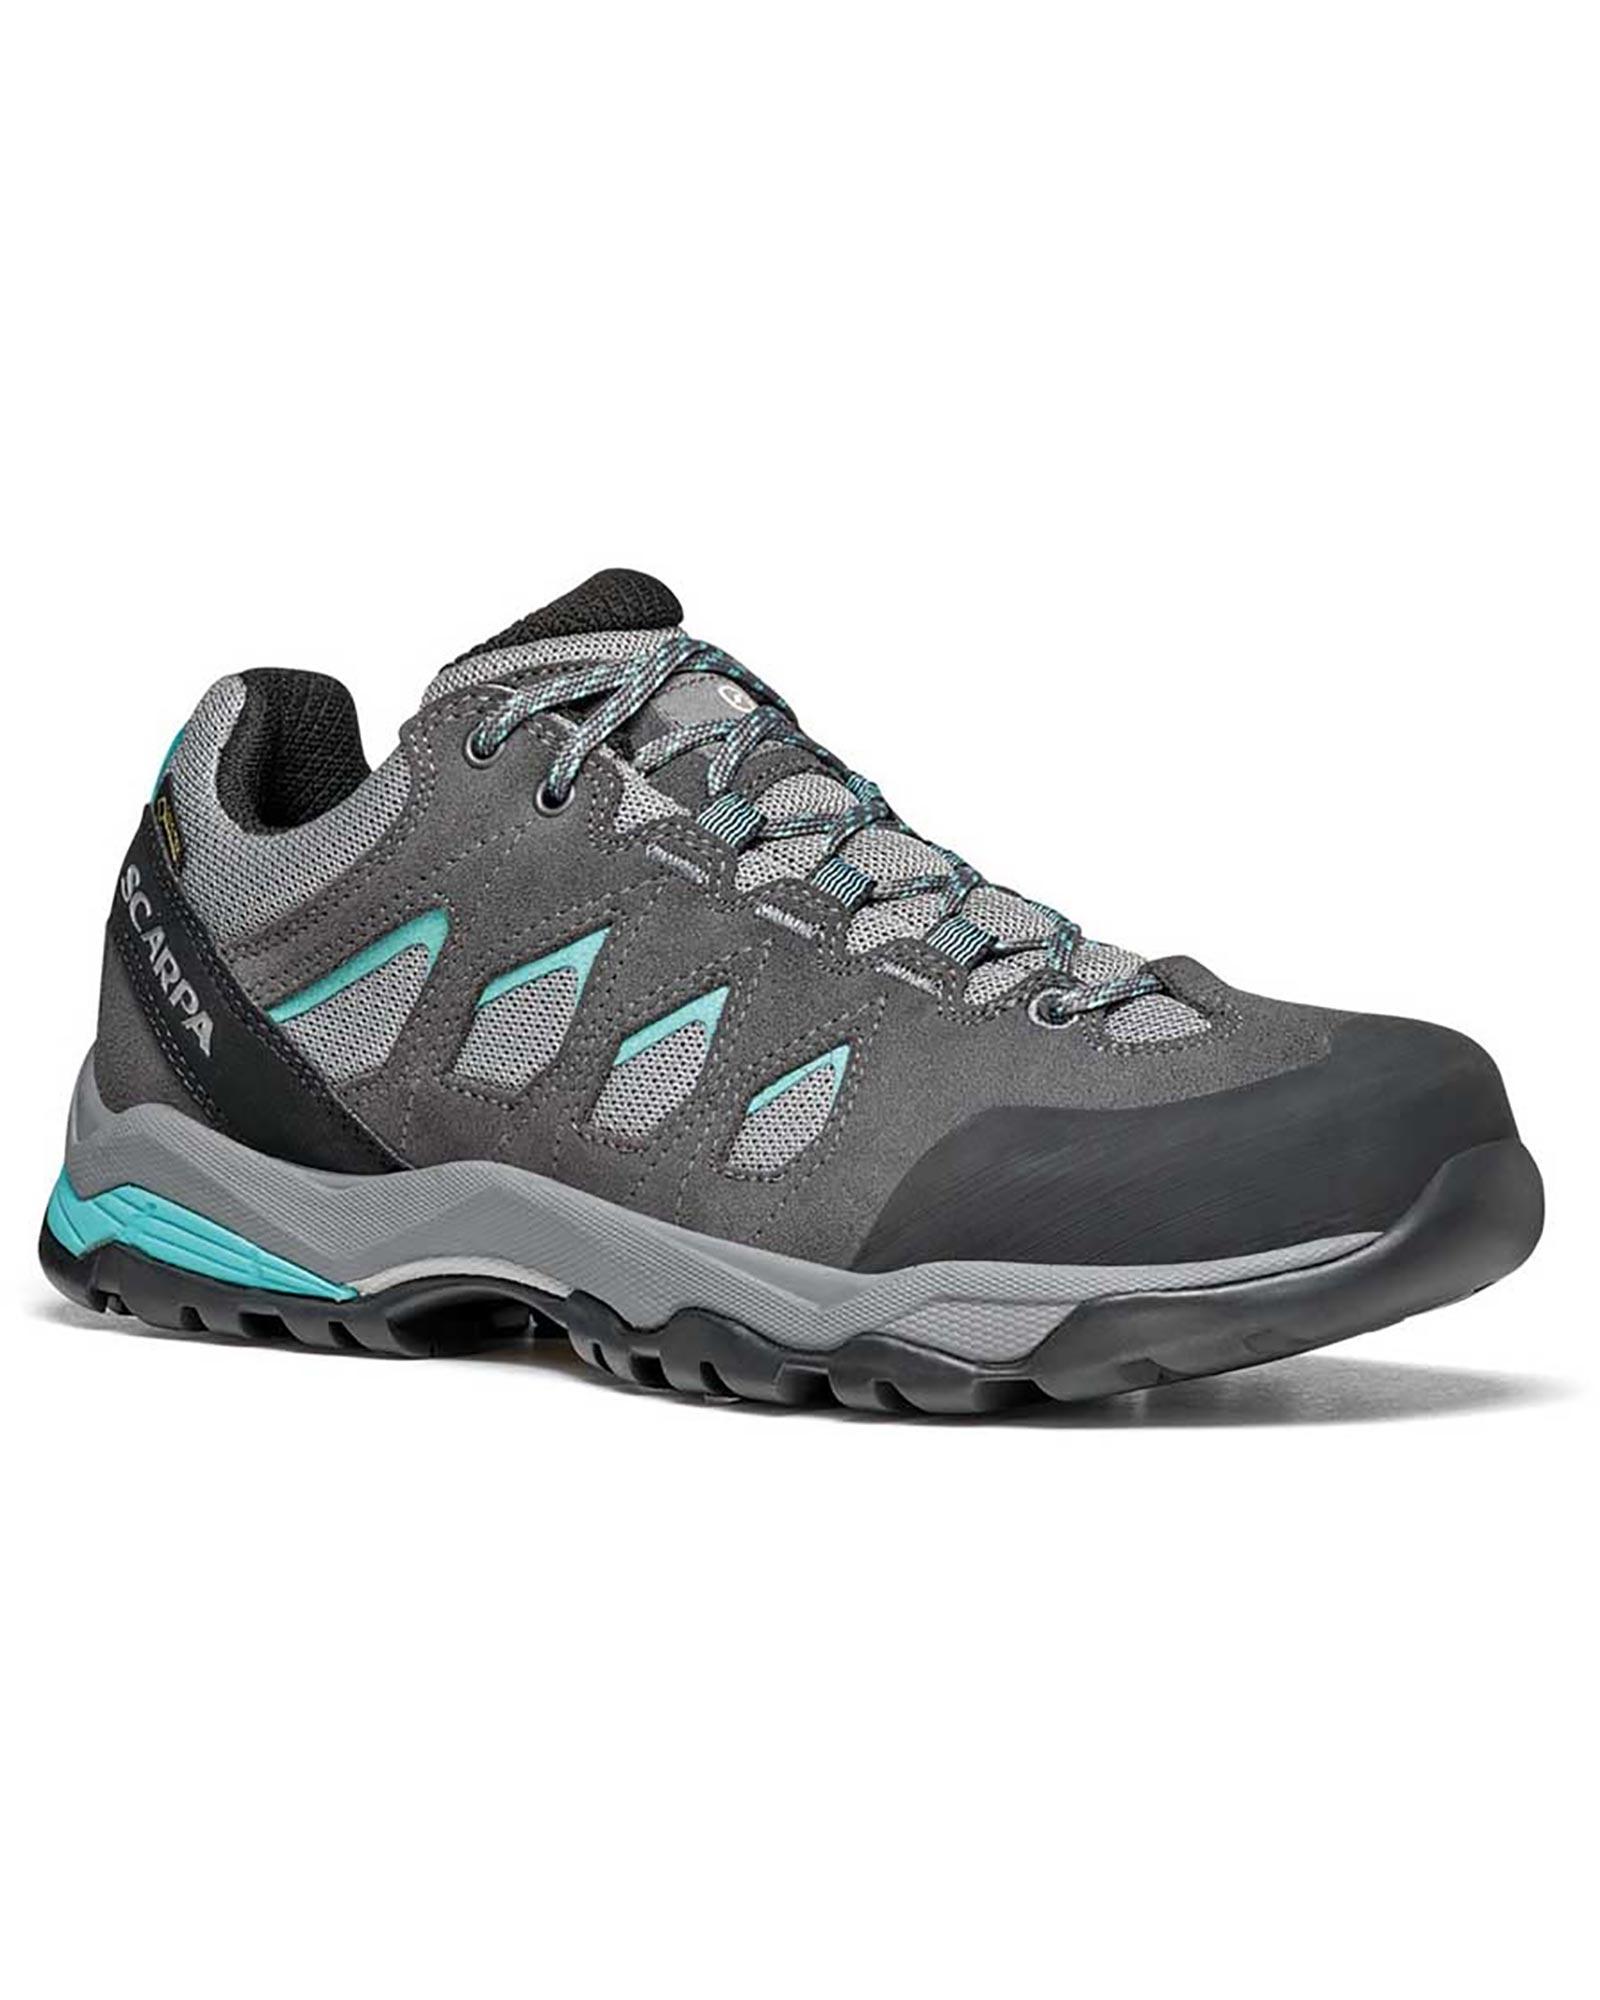 Scarpa Moraine GORE-TEX Women's Shoes 0